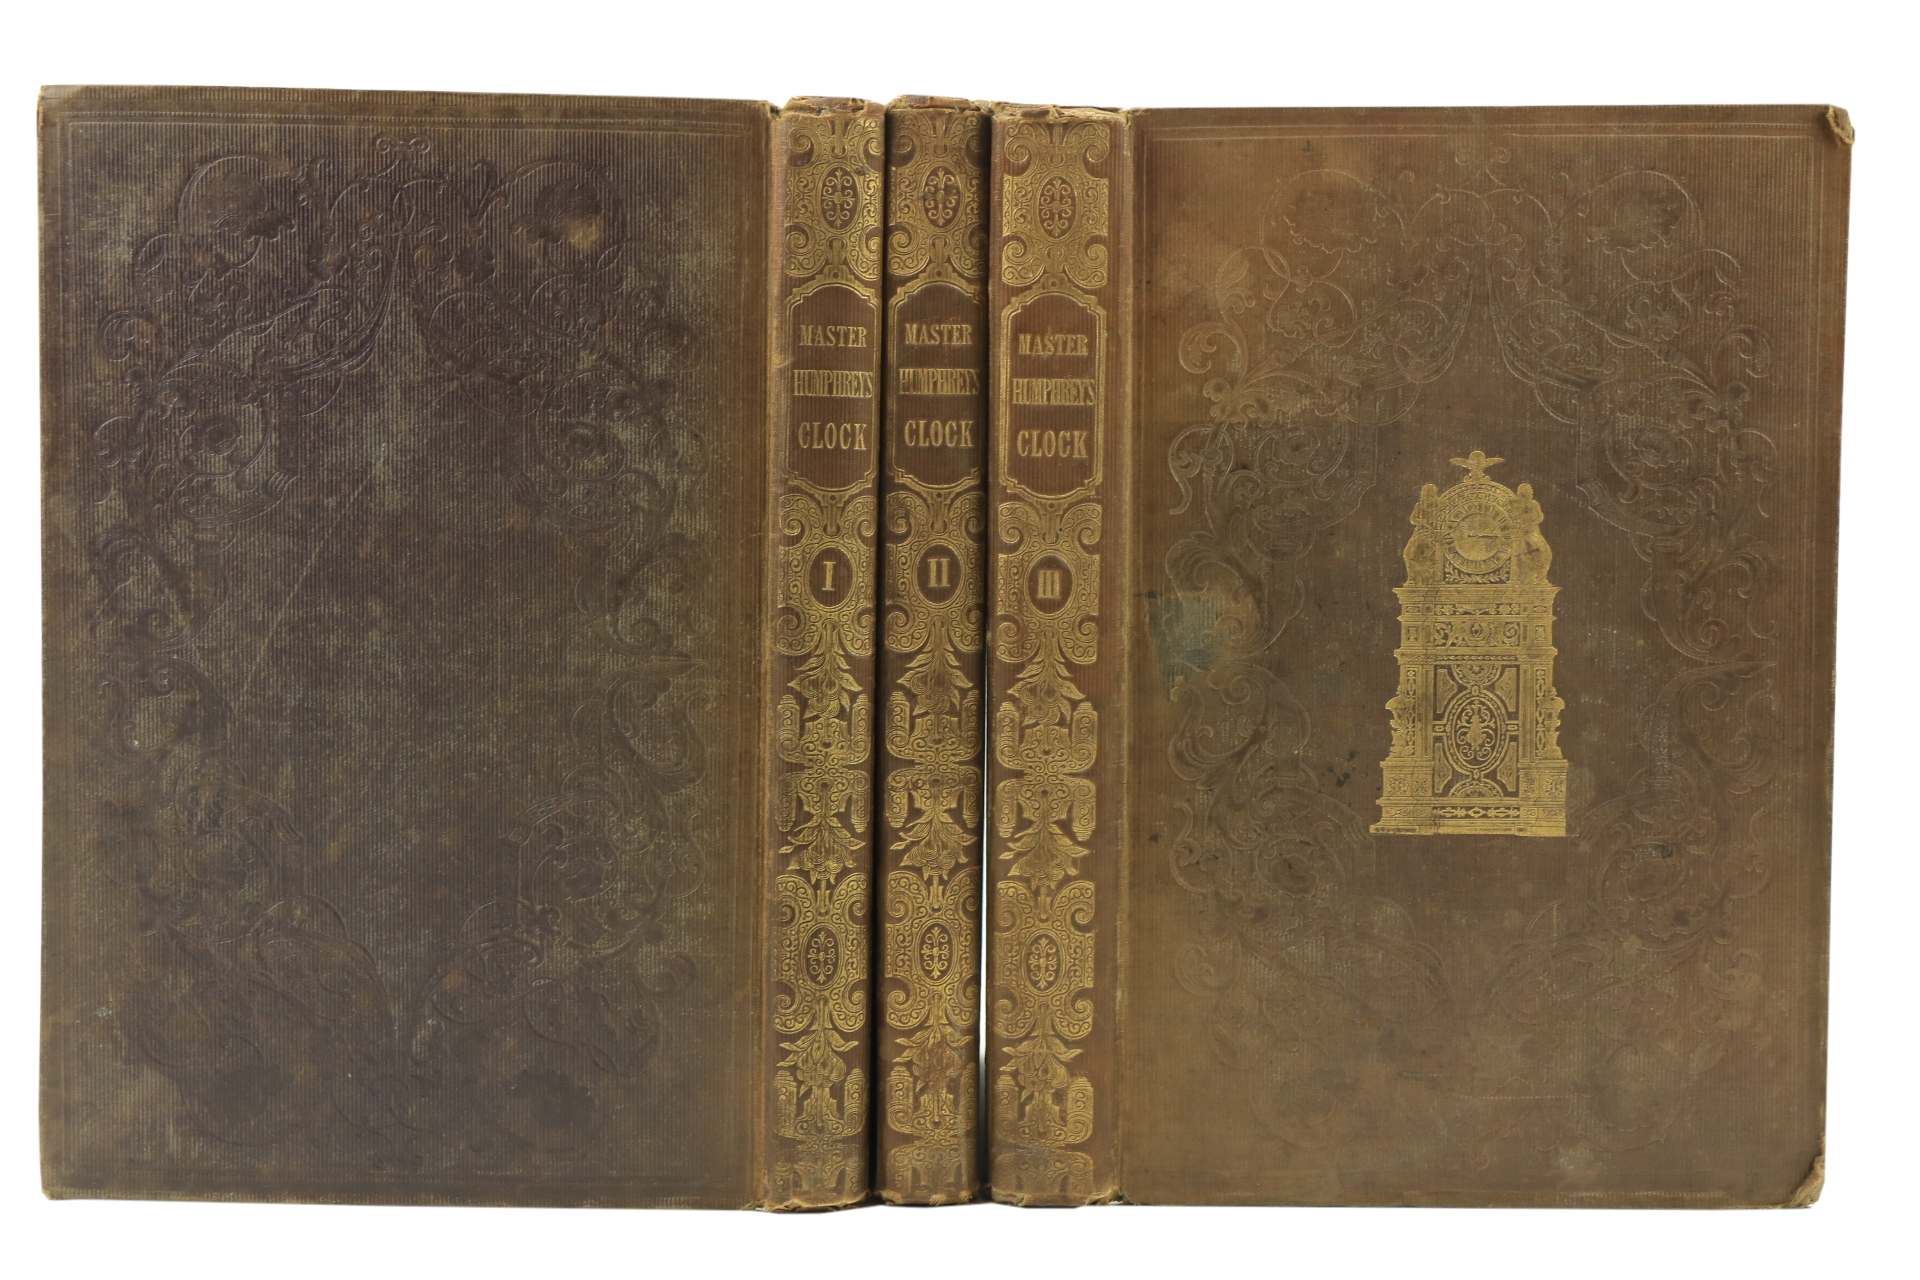 Dickens (Charles)ÿMaster Humphrey's clock, 3 vols. folio L. (Chapman & Hall) 1840.ÿFirst Edn., - Image 2 of 3